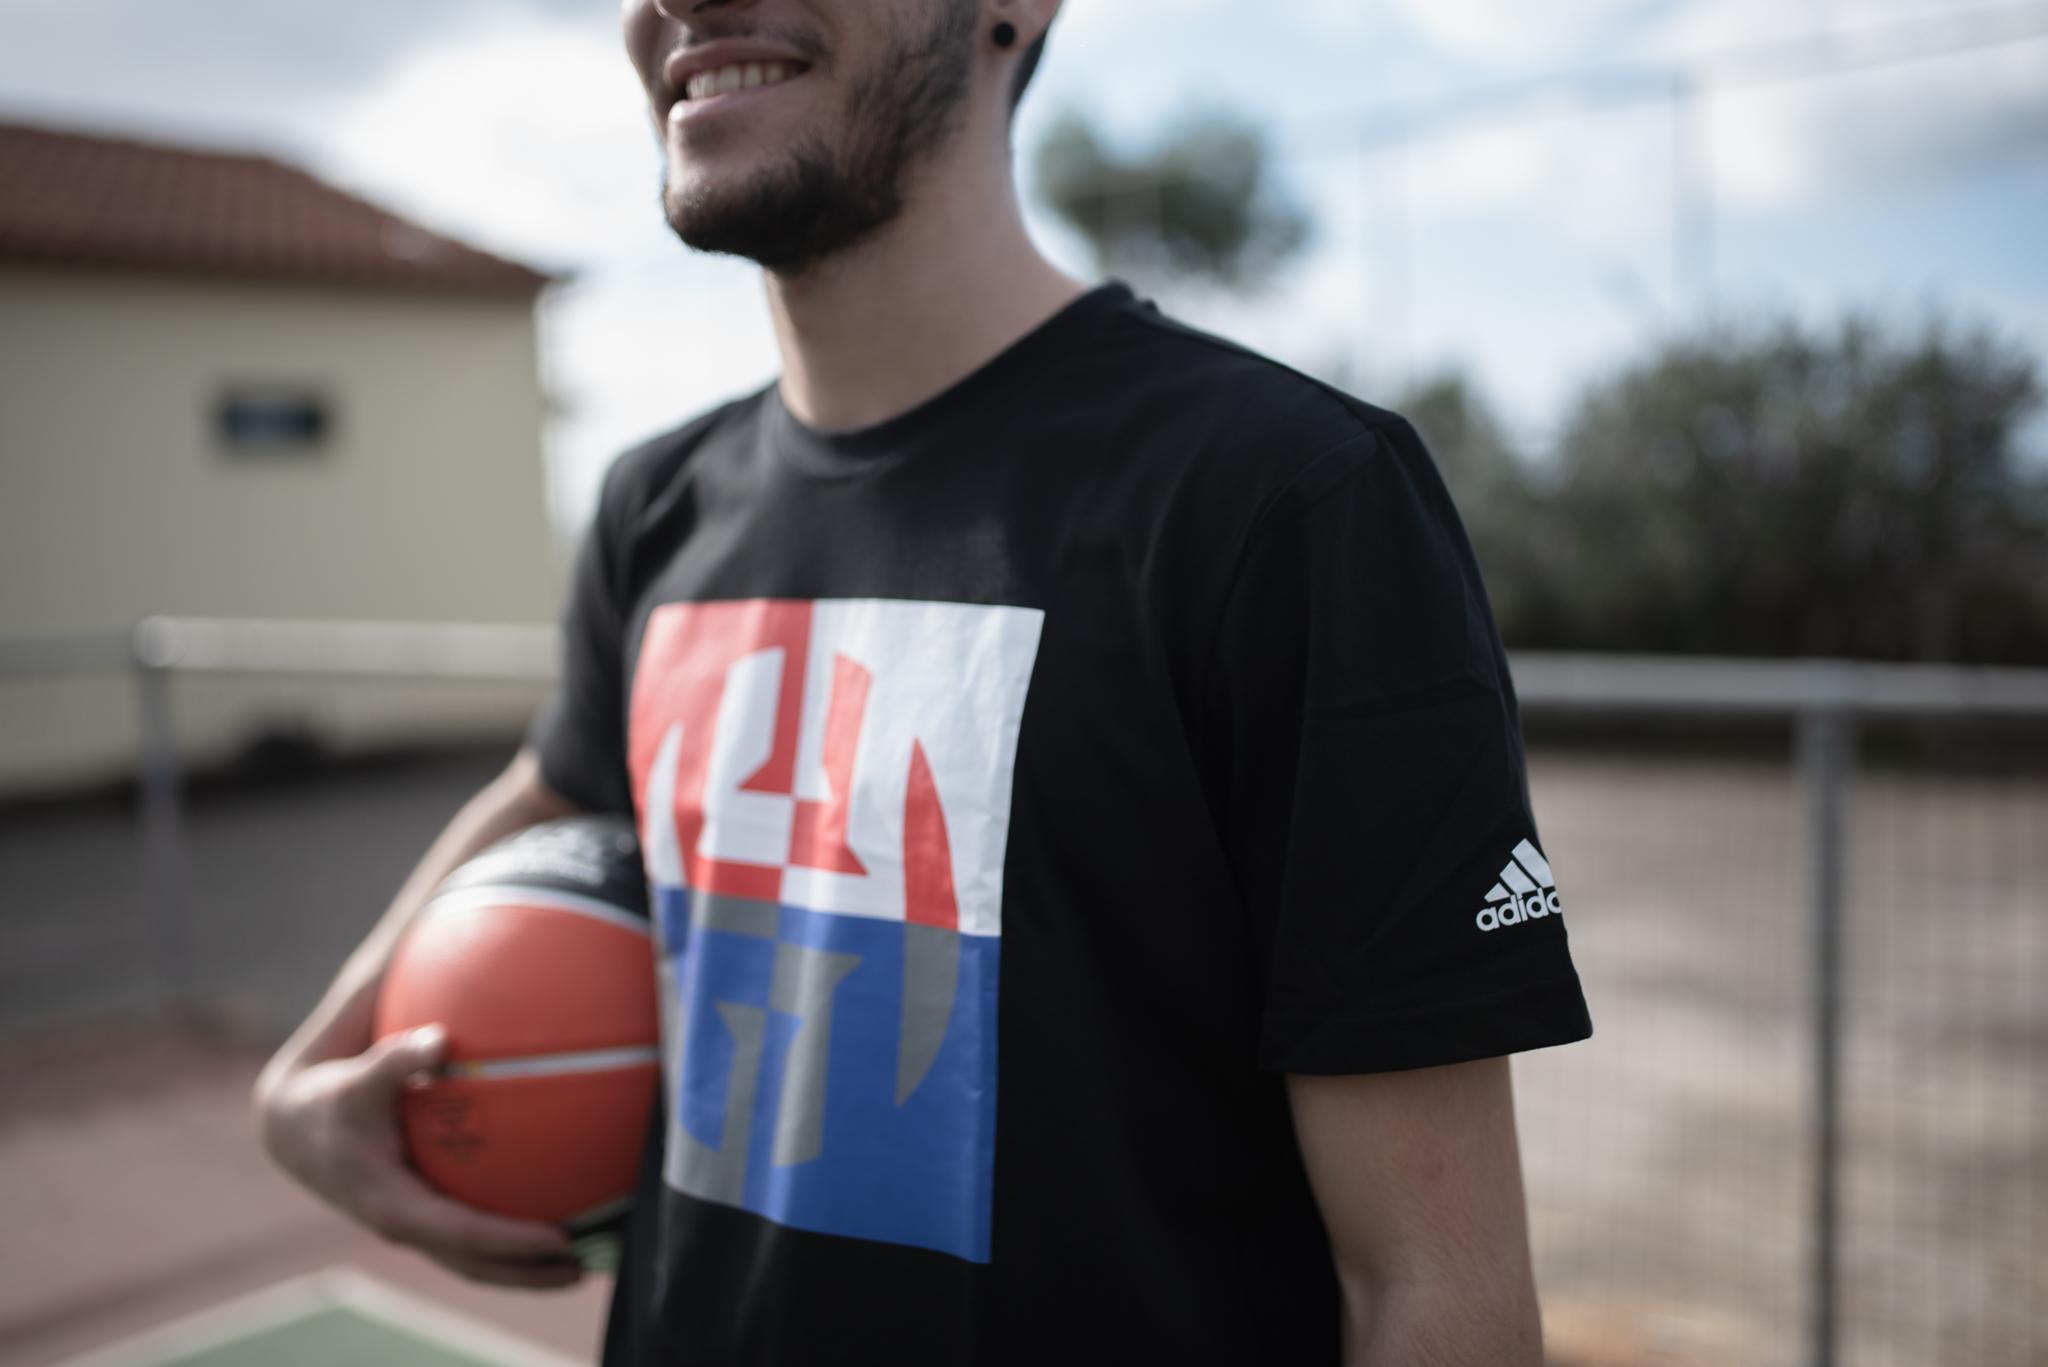 37bb1b3dc77 ... τον κολλητό ή το boyfriend, μιας και ήταν περίοδος του NBA κι όλοι  είναι ακόμα επηρεασμένοι, δεν υπάρχει καλύτερο δώρο από ένα μπασκετικό  παπούτσι που ...